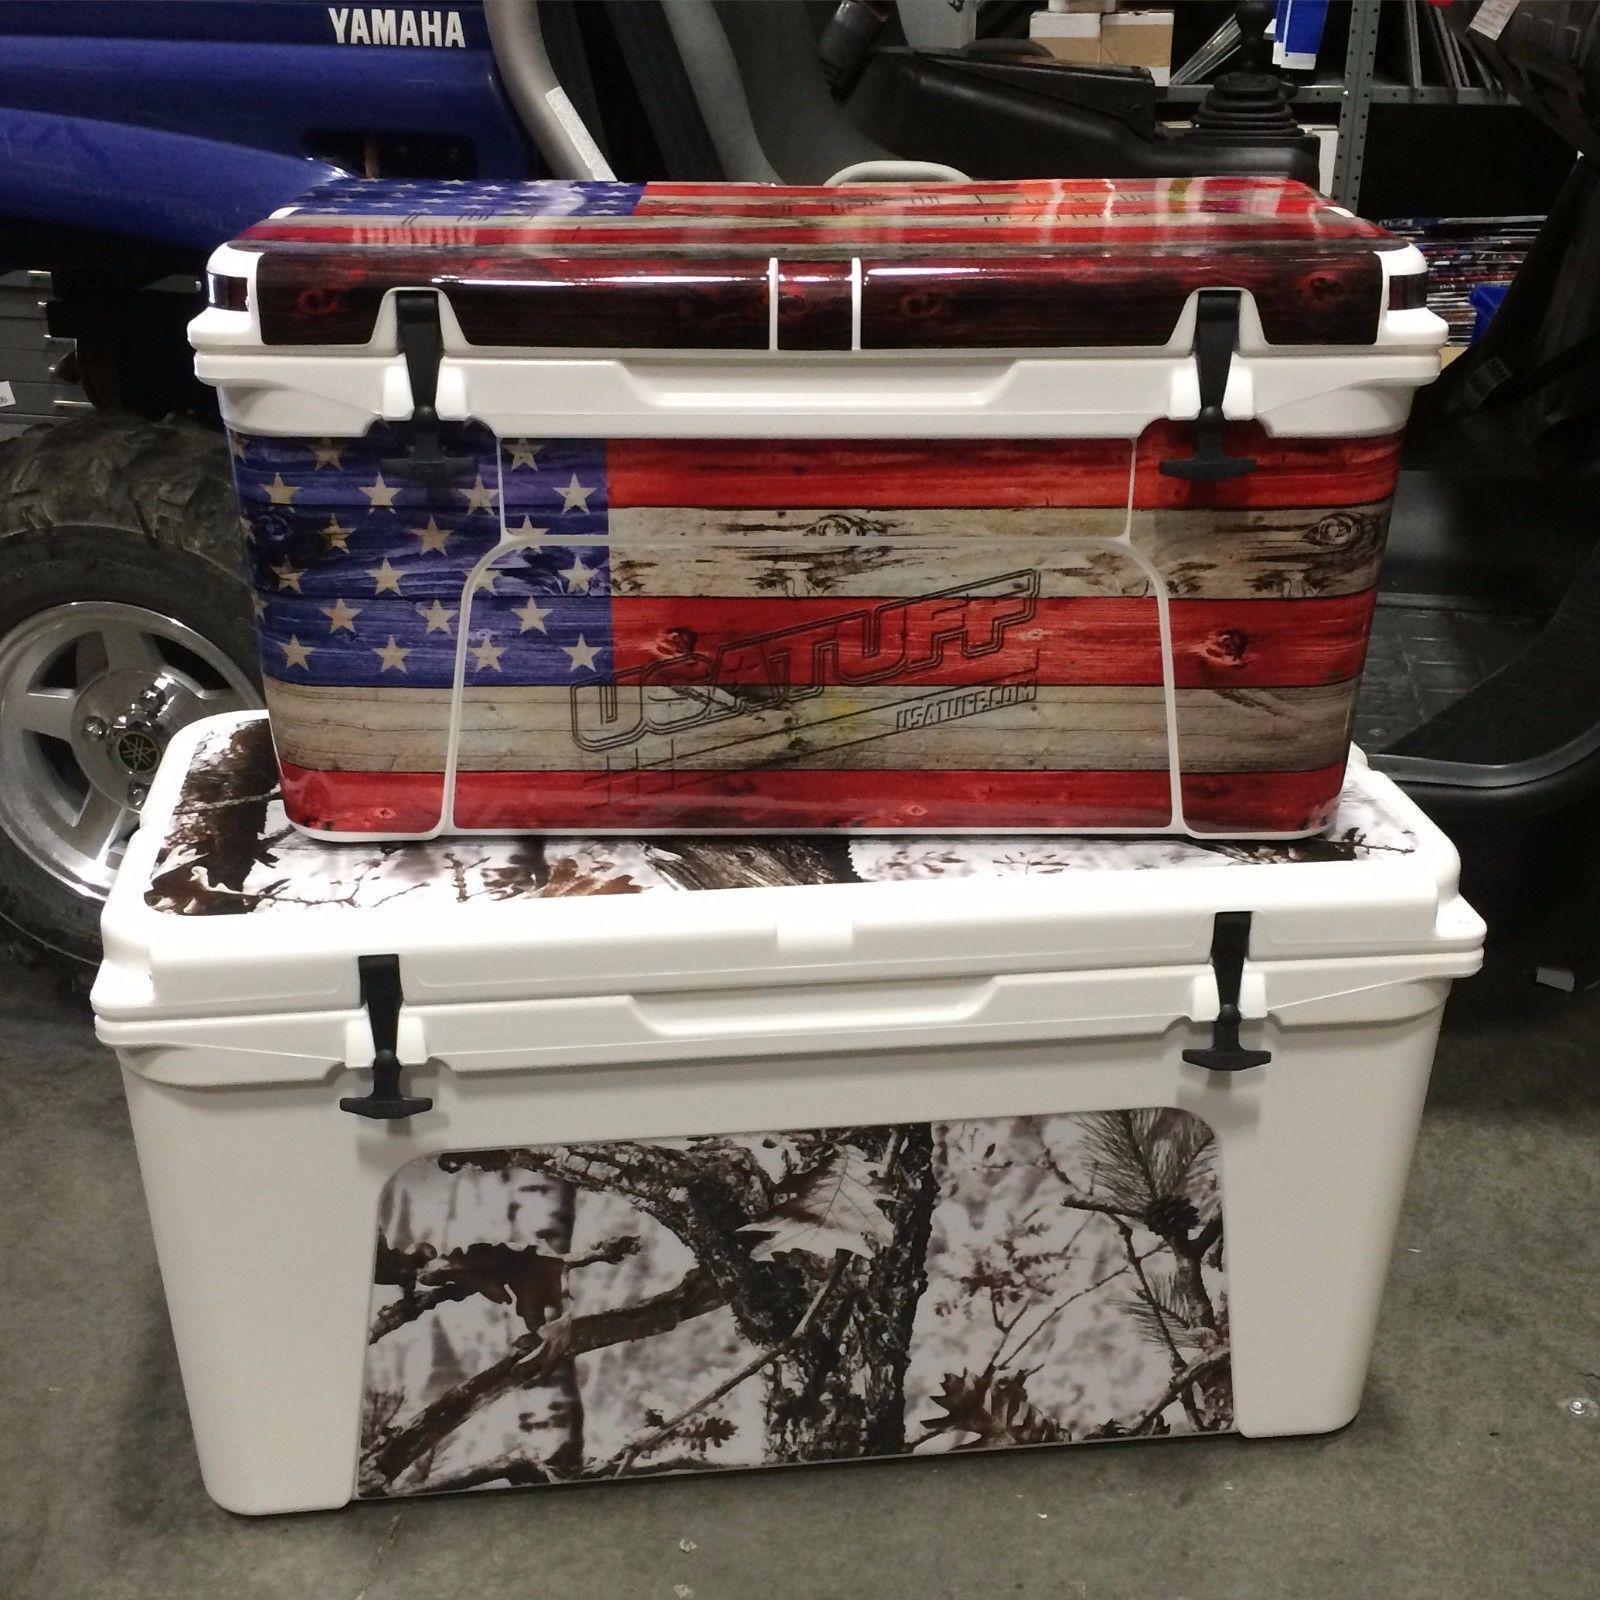 USATuff Decal Wrap Full Kit Kit Kit fits IGLOO Sportsman 20qt Cooler Old Glory a143ae